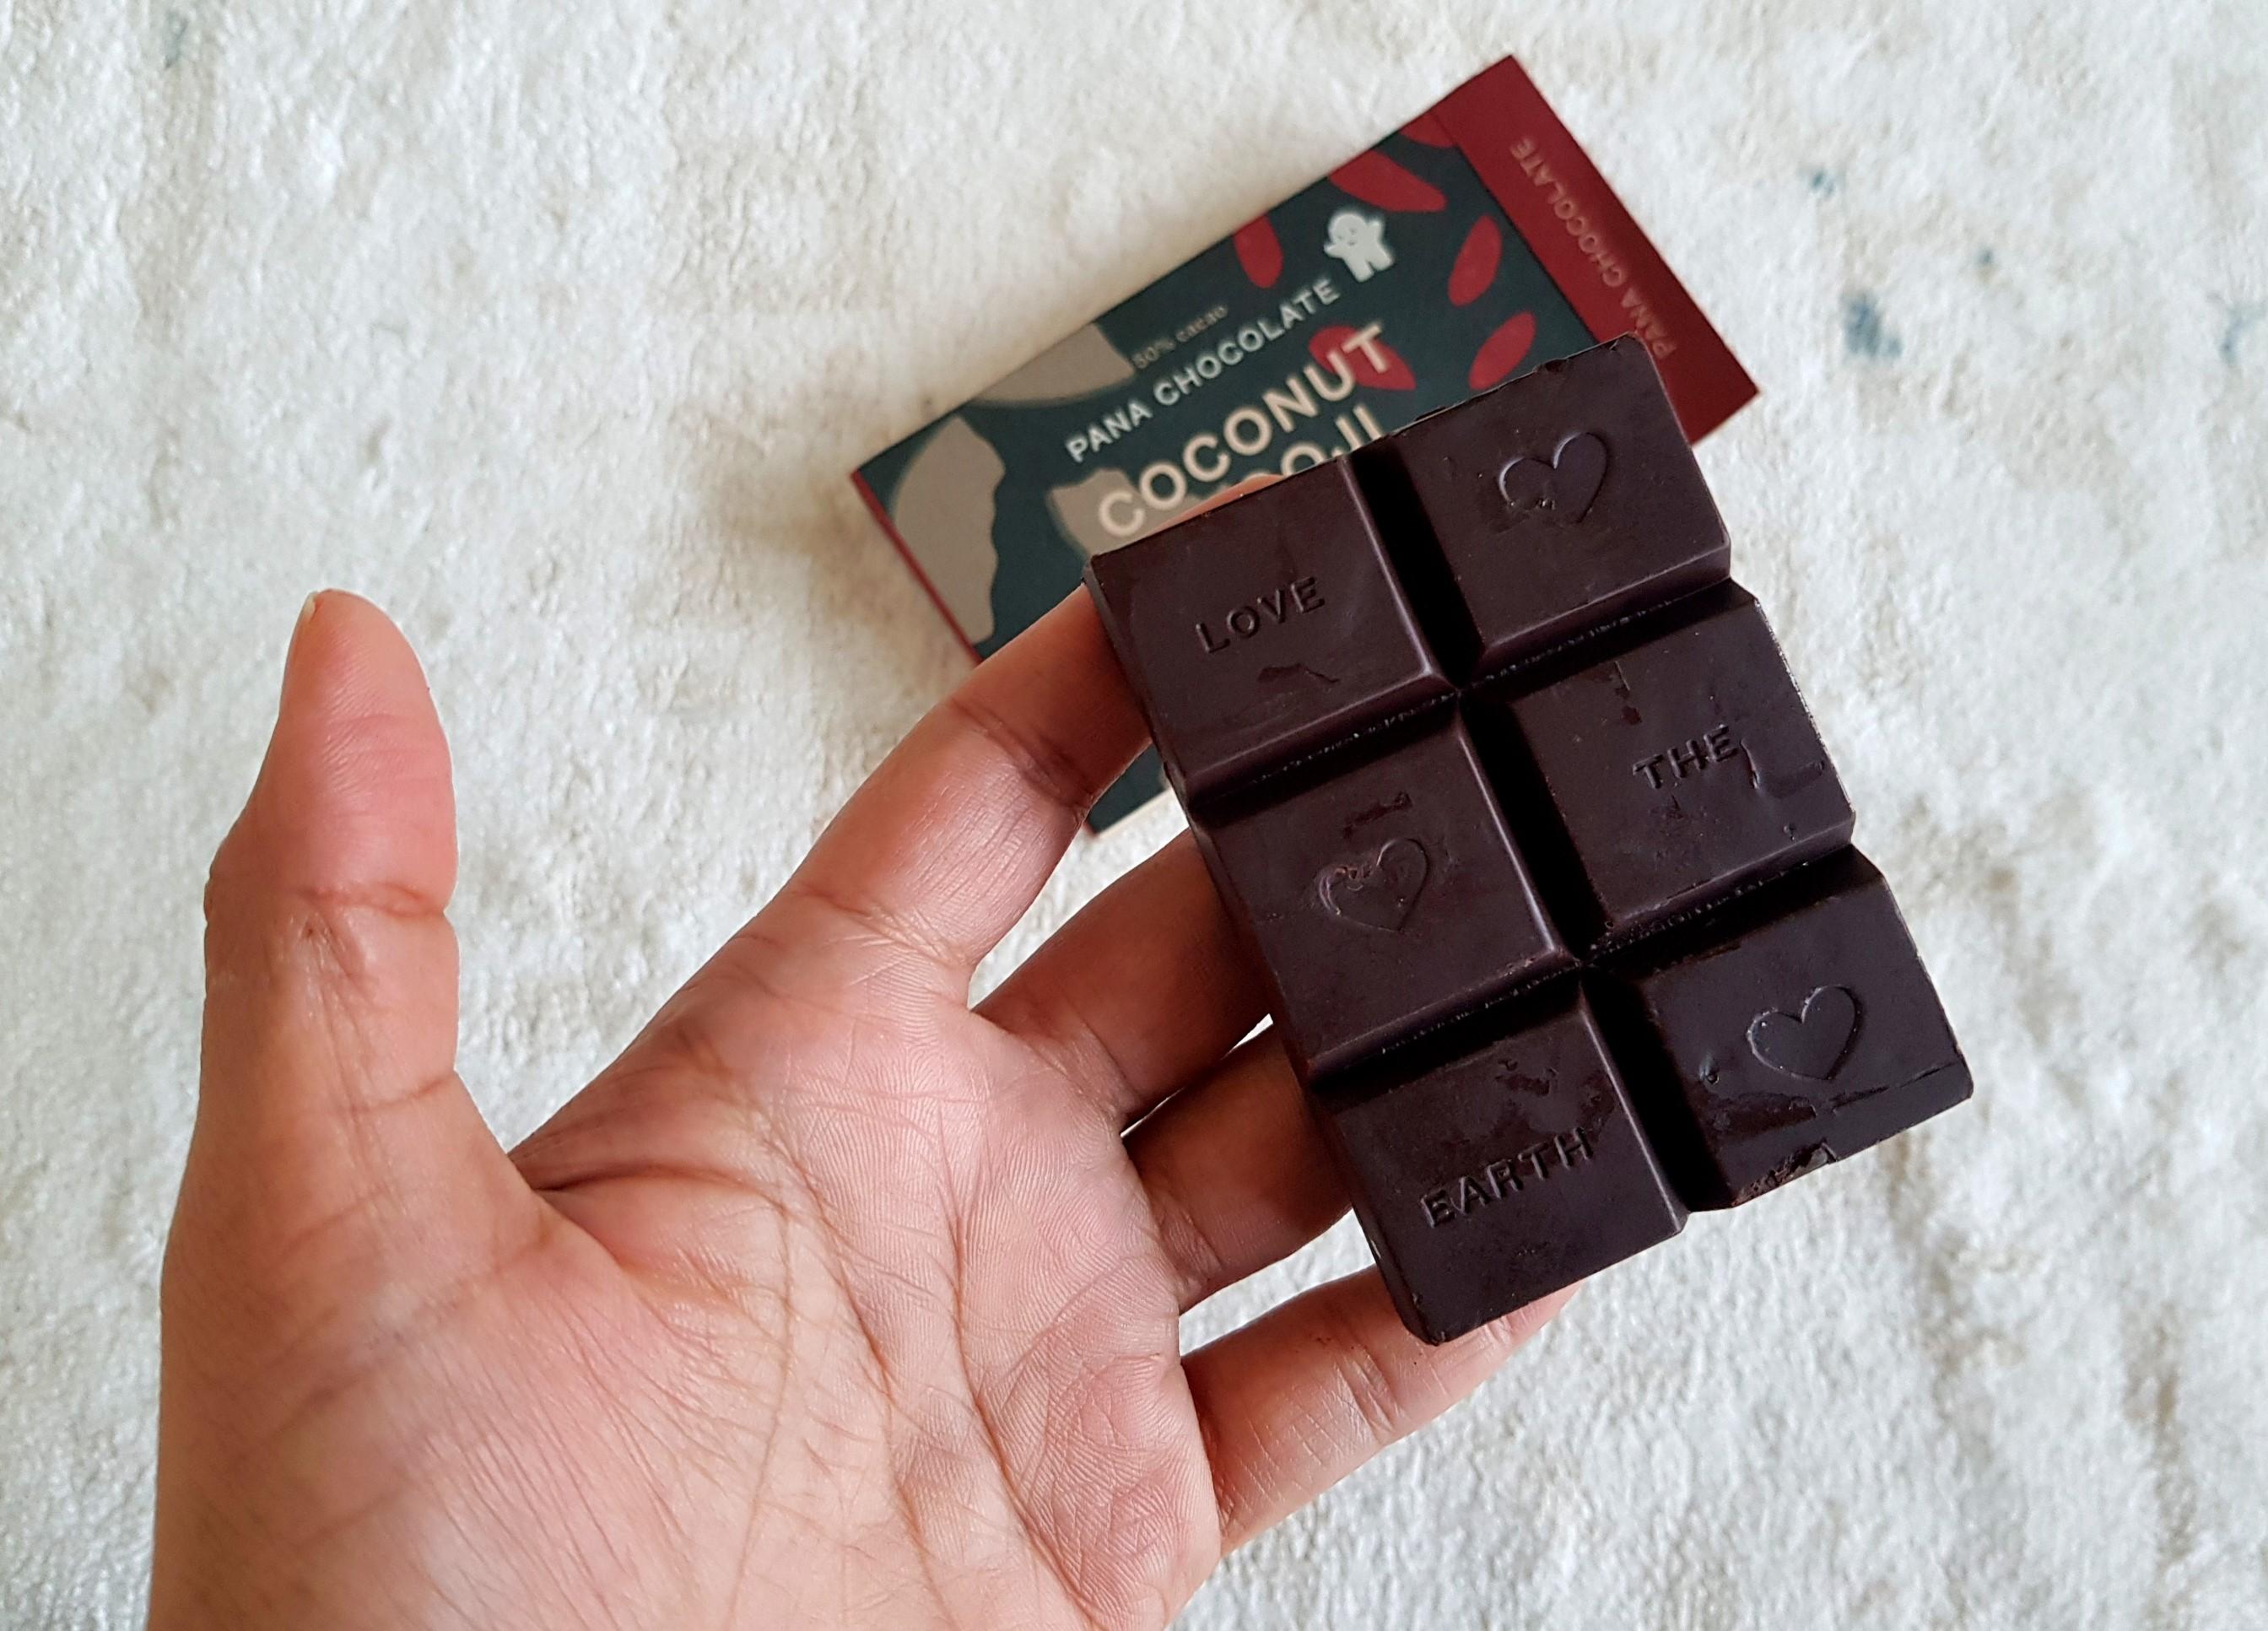 Best Vegan Chocolates - Fairtrade Chocolates - Pana Vegan Chocolates in Dubai - Ethical chocolates